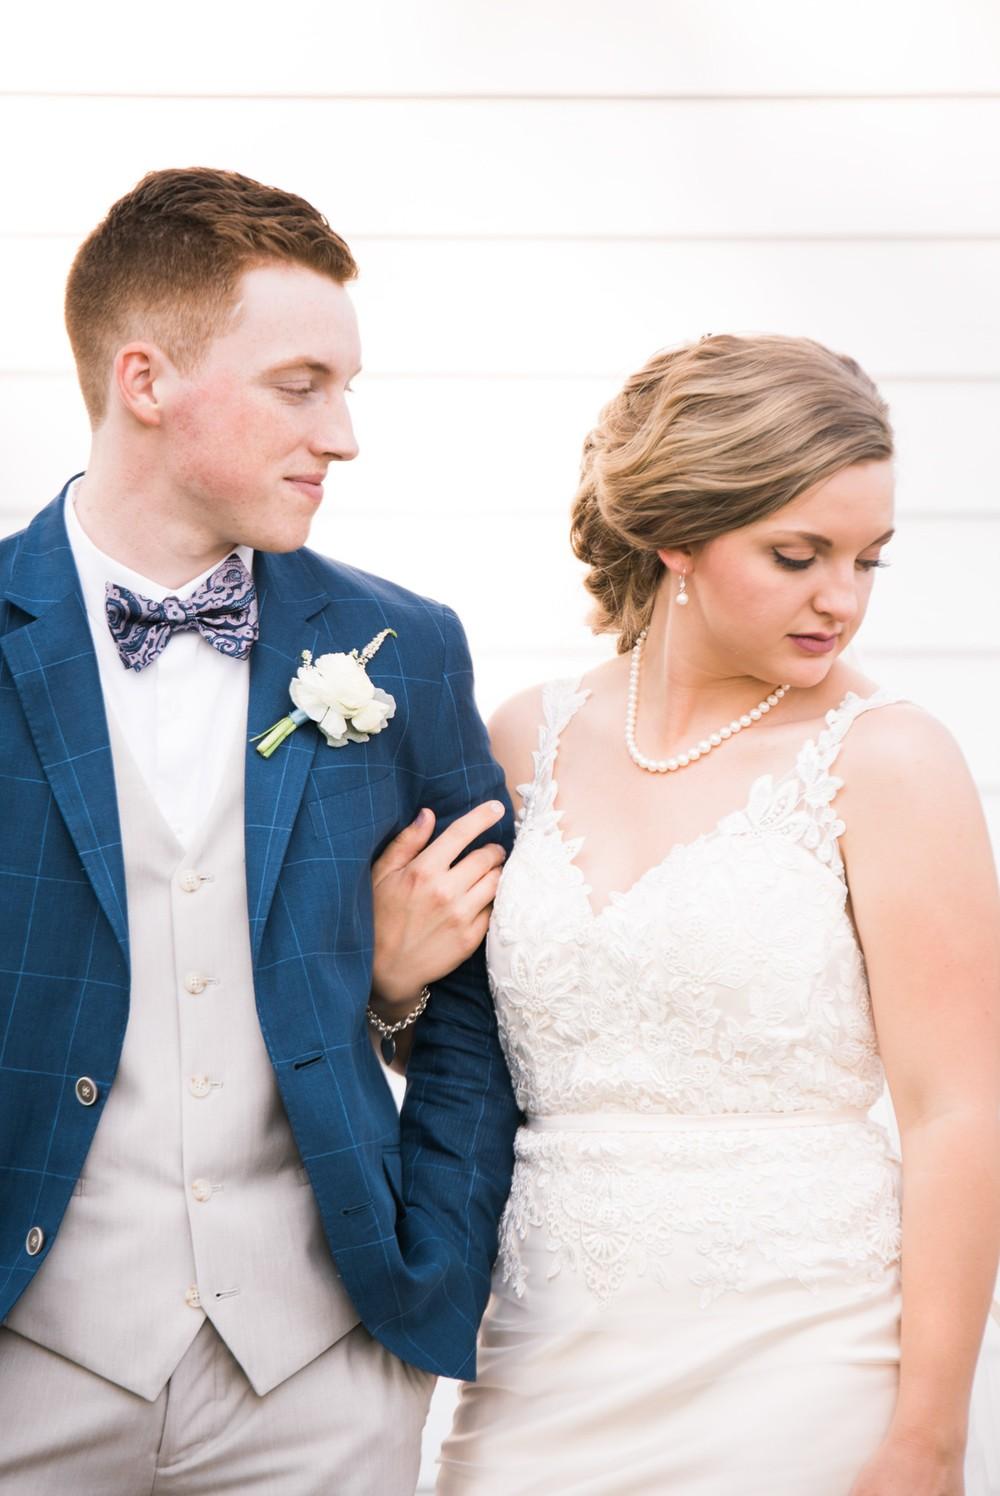 trivium_lynchburg_va_wedding_estate_wedding_photography_wedding_photographers (56).jpg